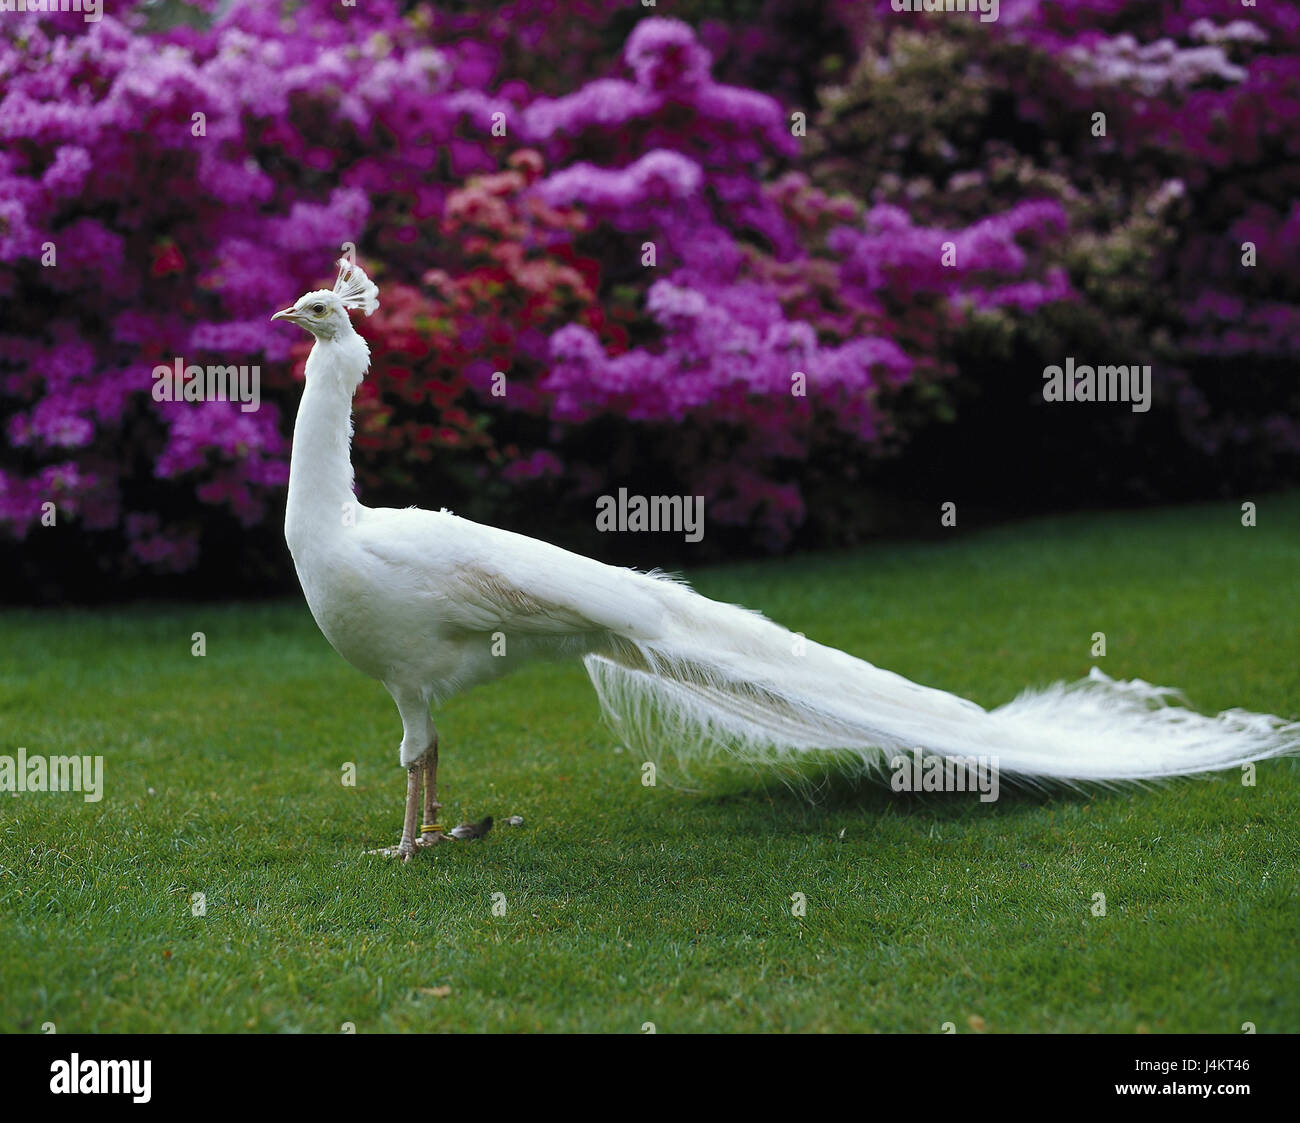 White peacock, Pavo cristatus. alb, preview birds, Vogel, gallinaceous birds, Galliformes, Phasianidae, Phasianidae, - Stock Image